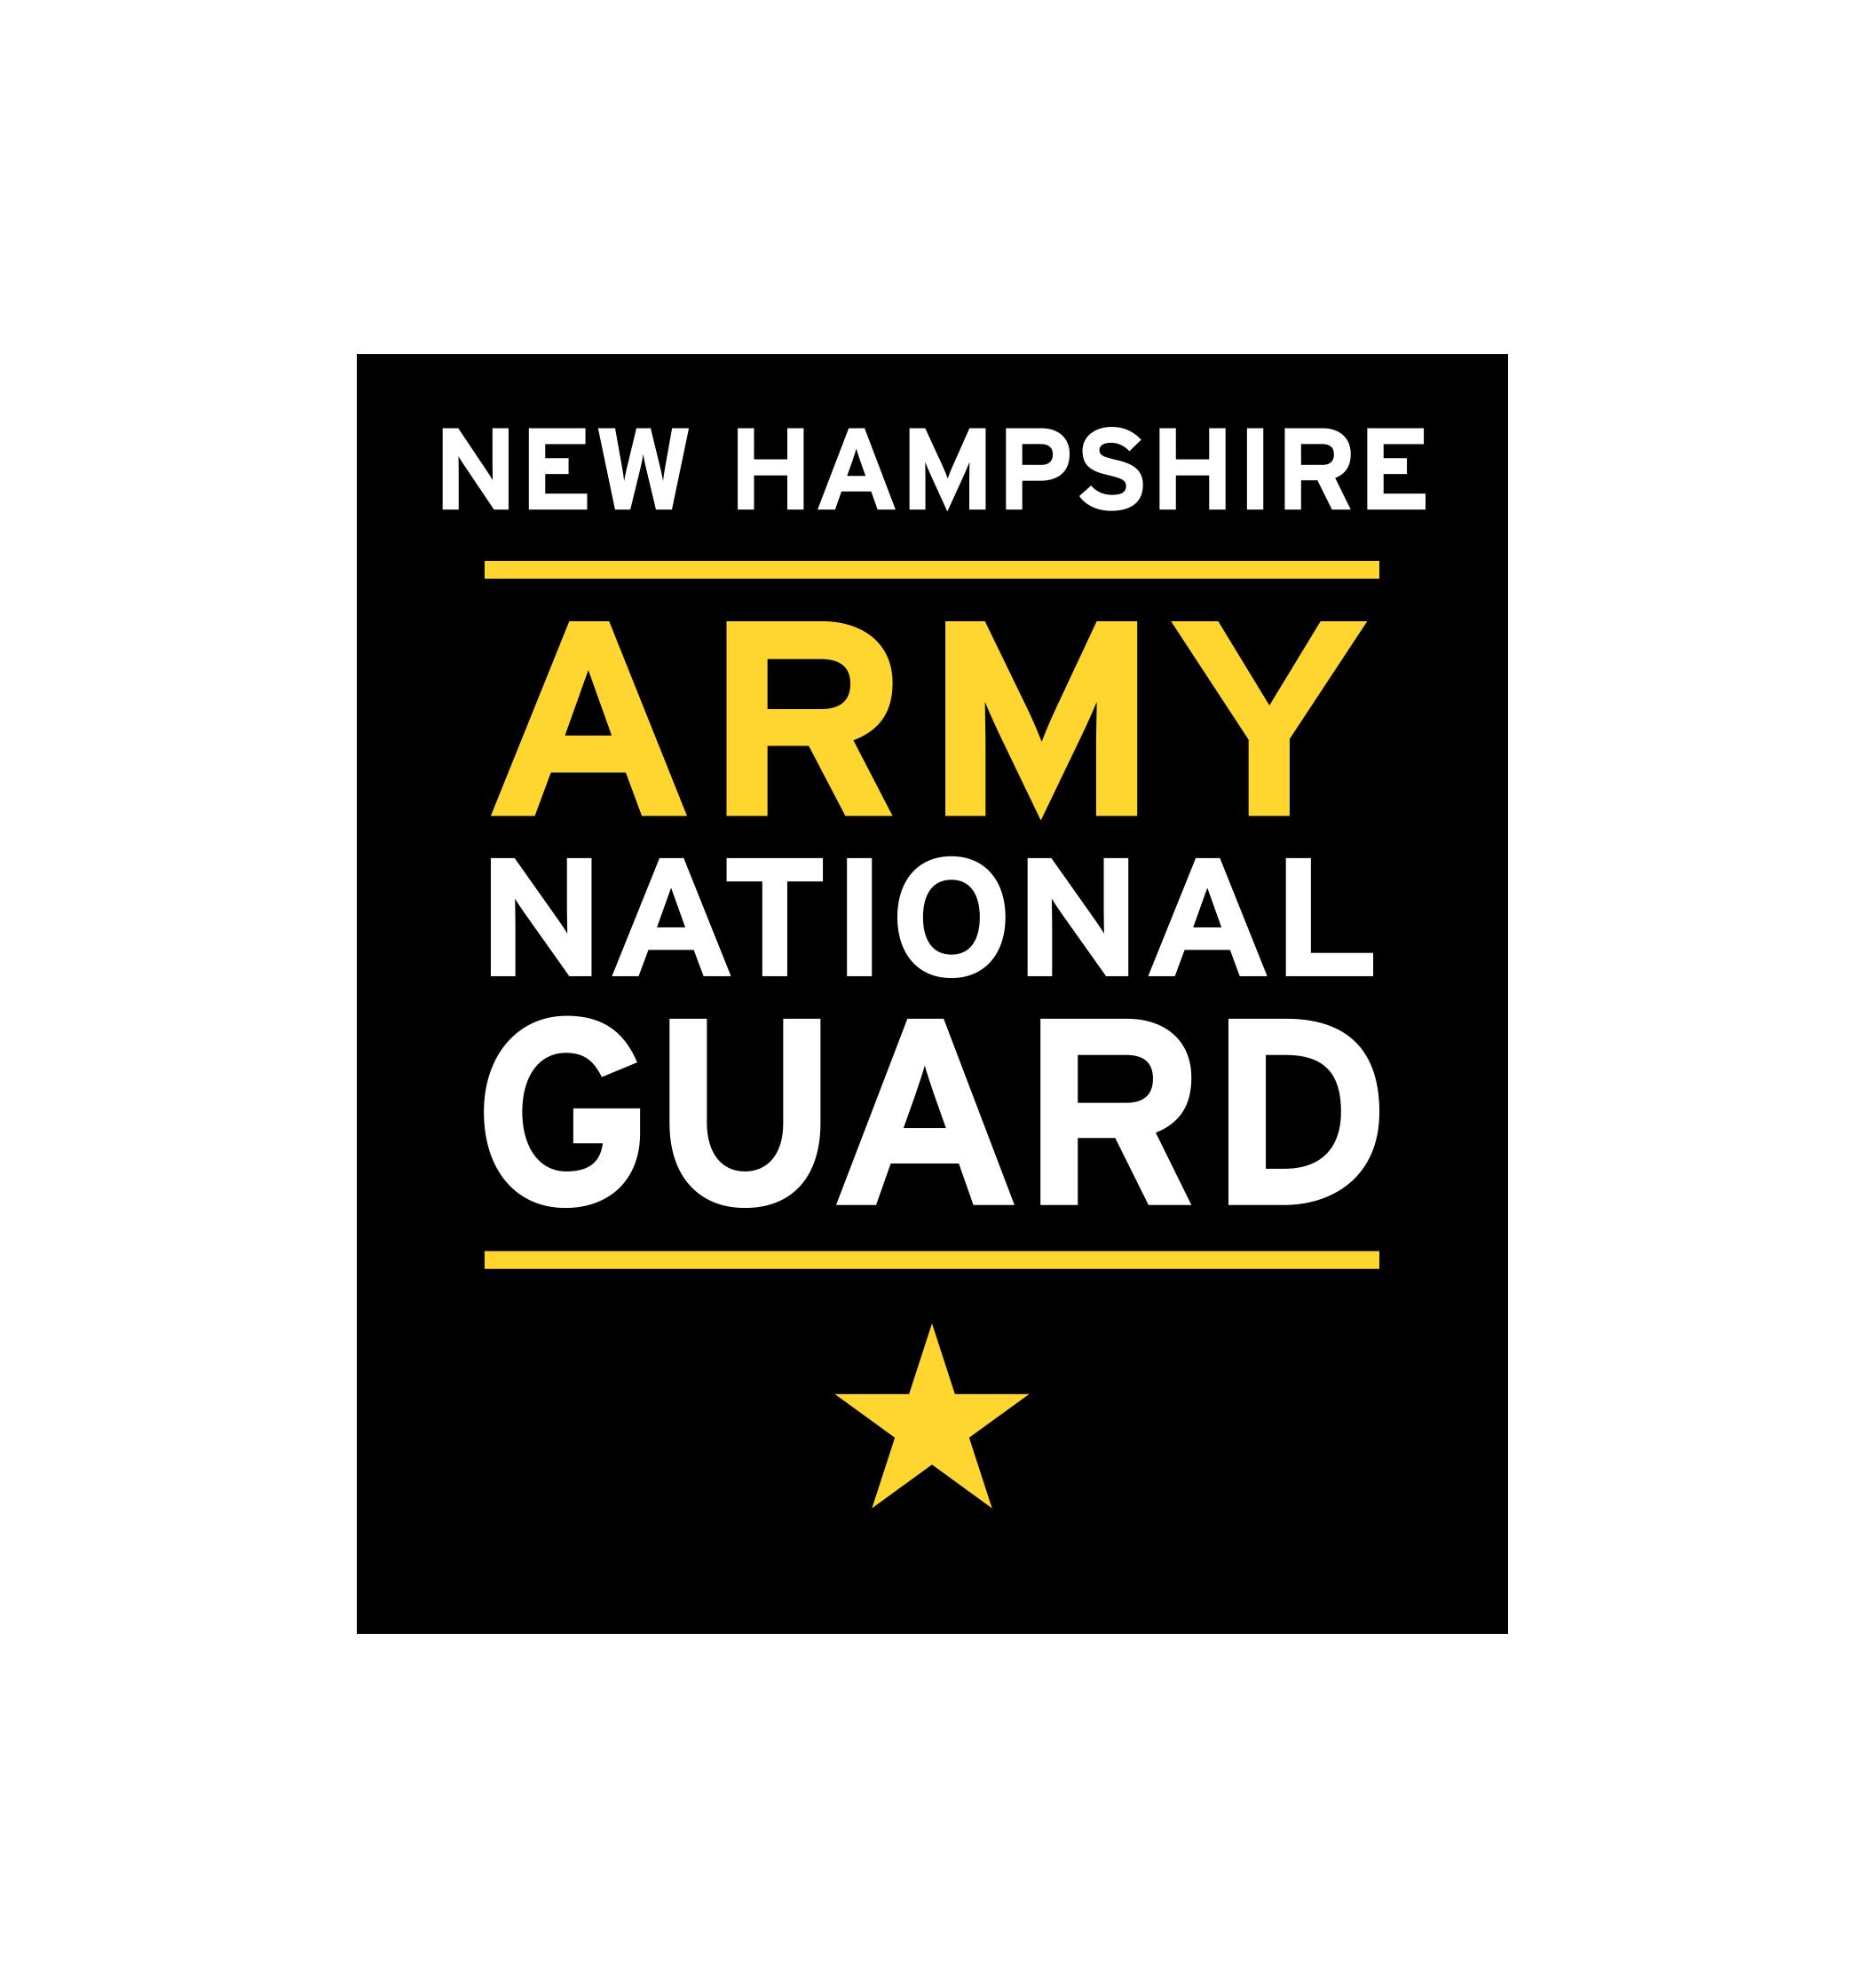 NH Army National Guard